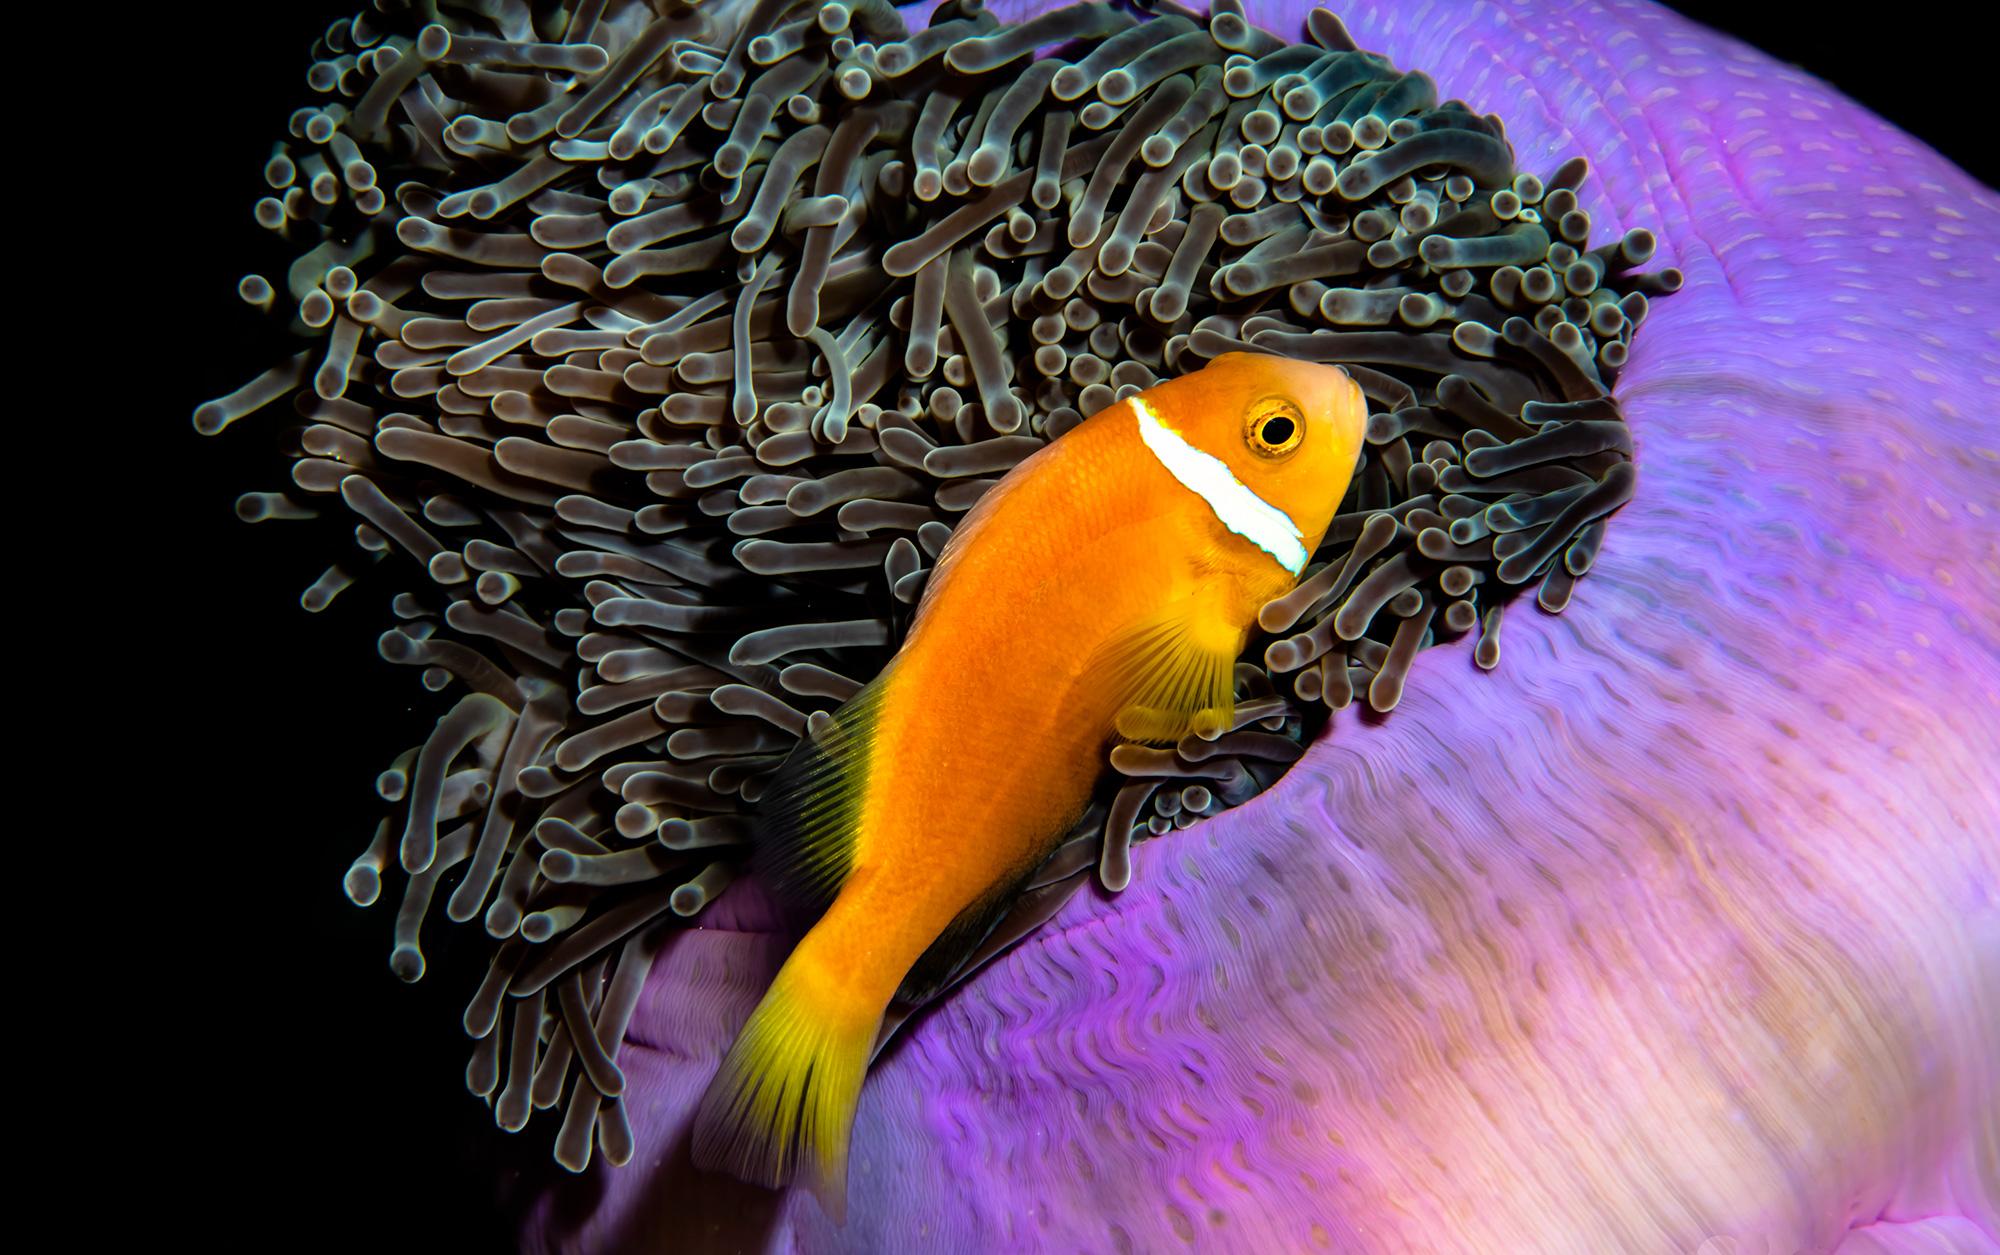 ocean photography awards 2020 04